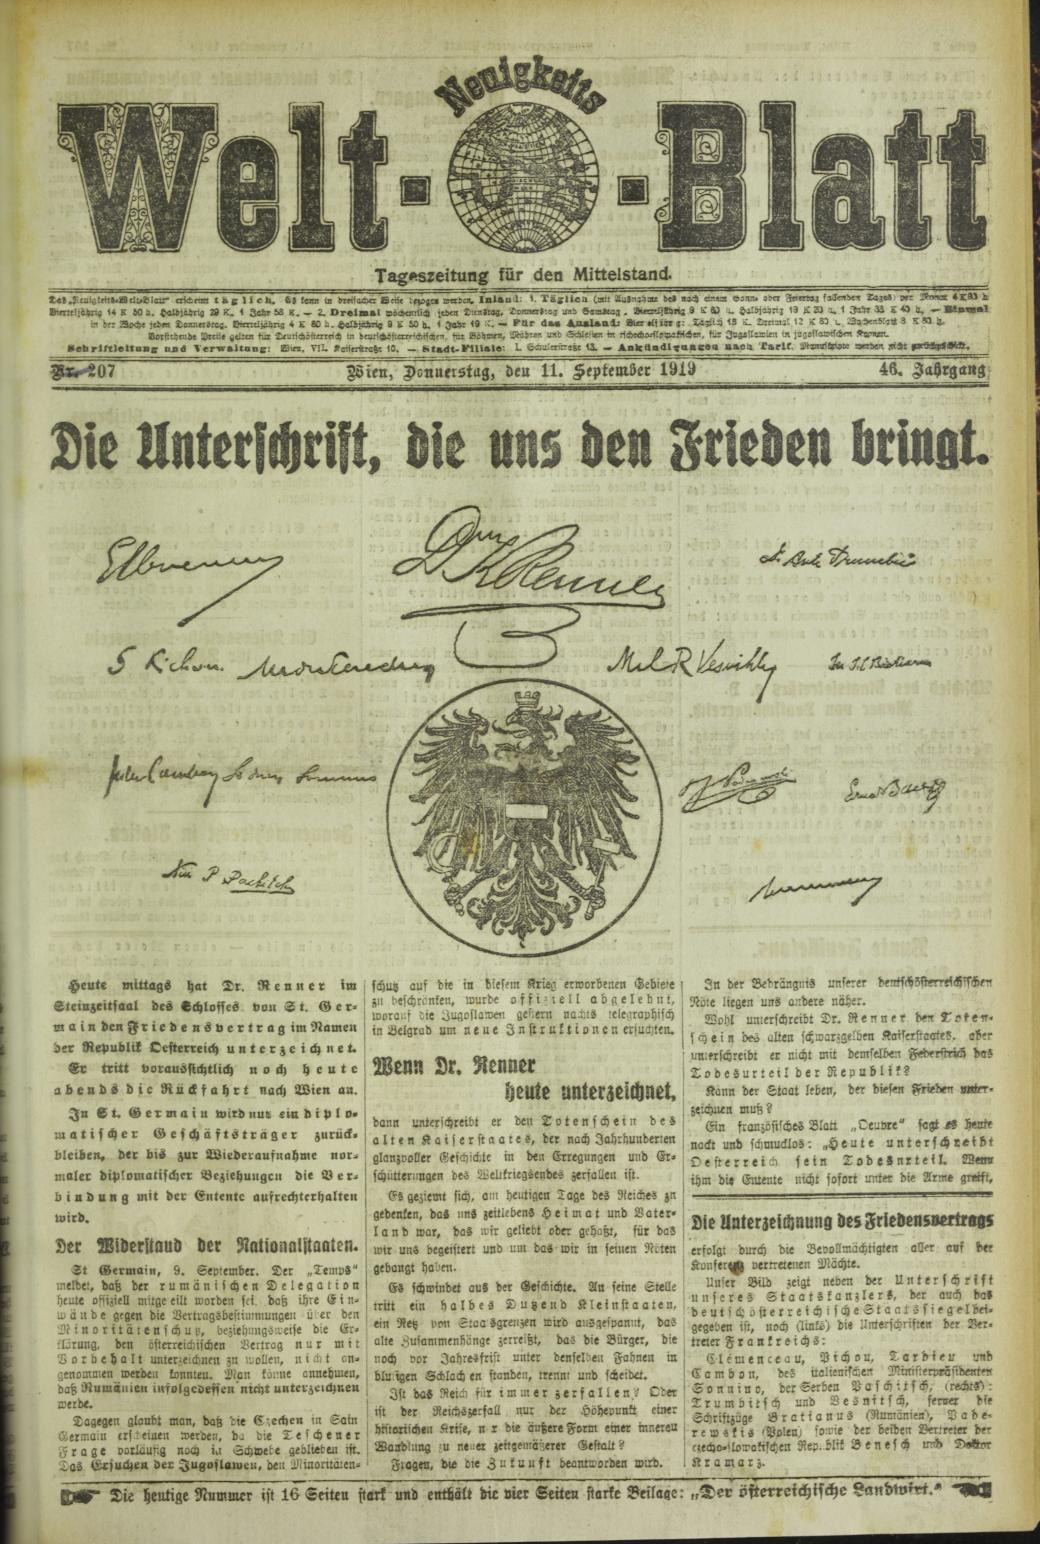 Neuigkeits Welt-Blatt (National Library Austria)